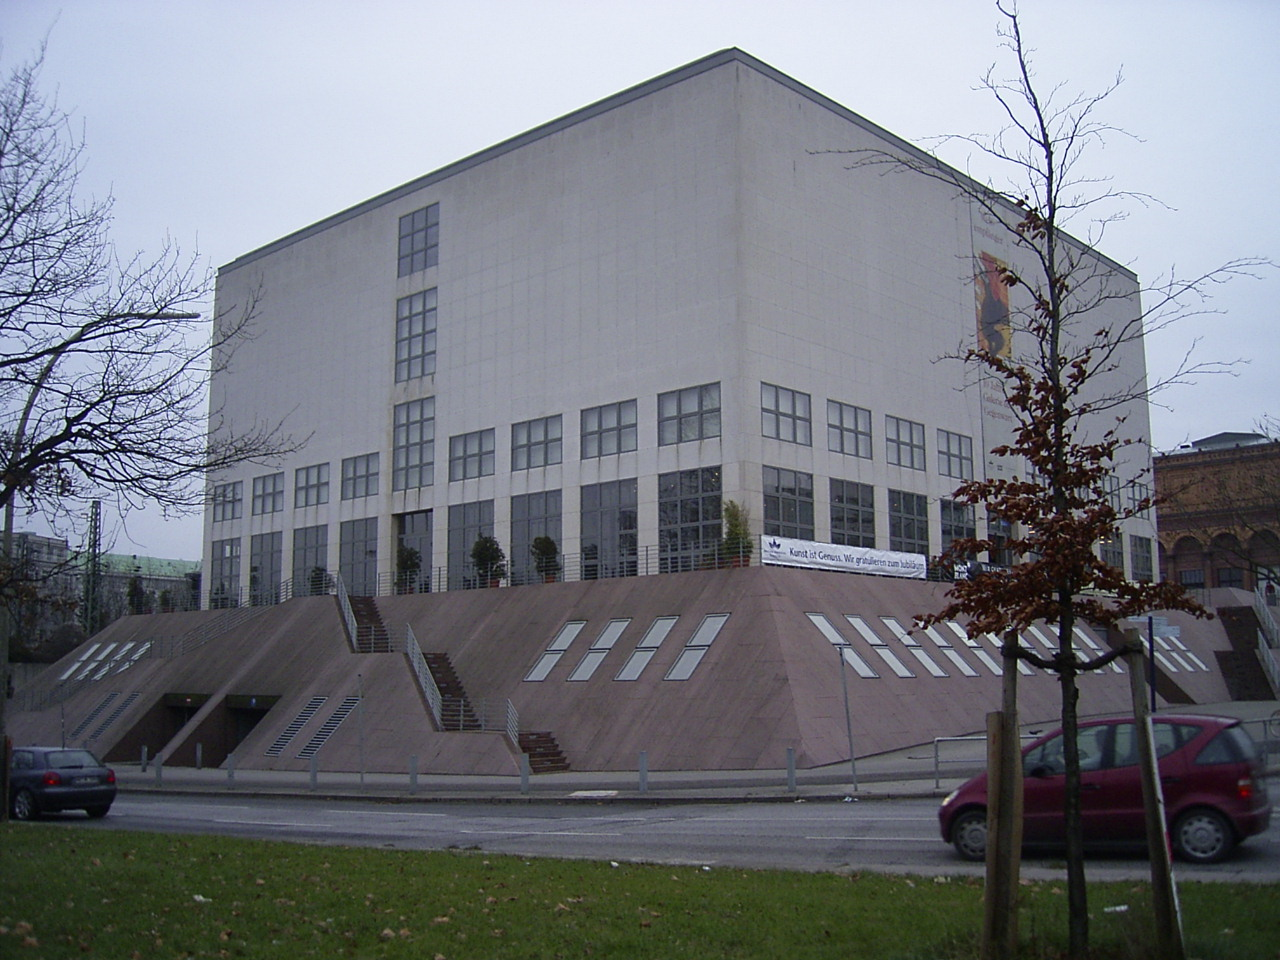 Bevorzugt Geschoss (Architektur) – Wikipedia WL53